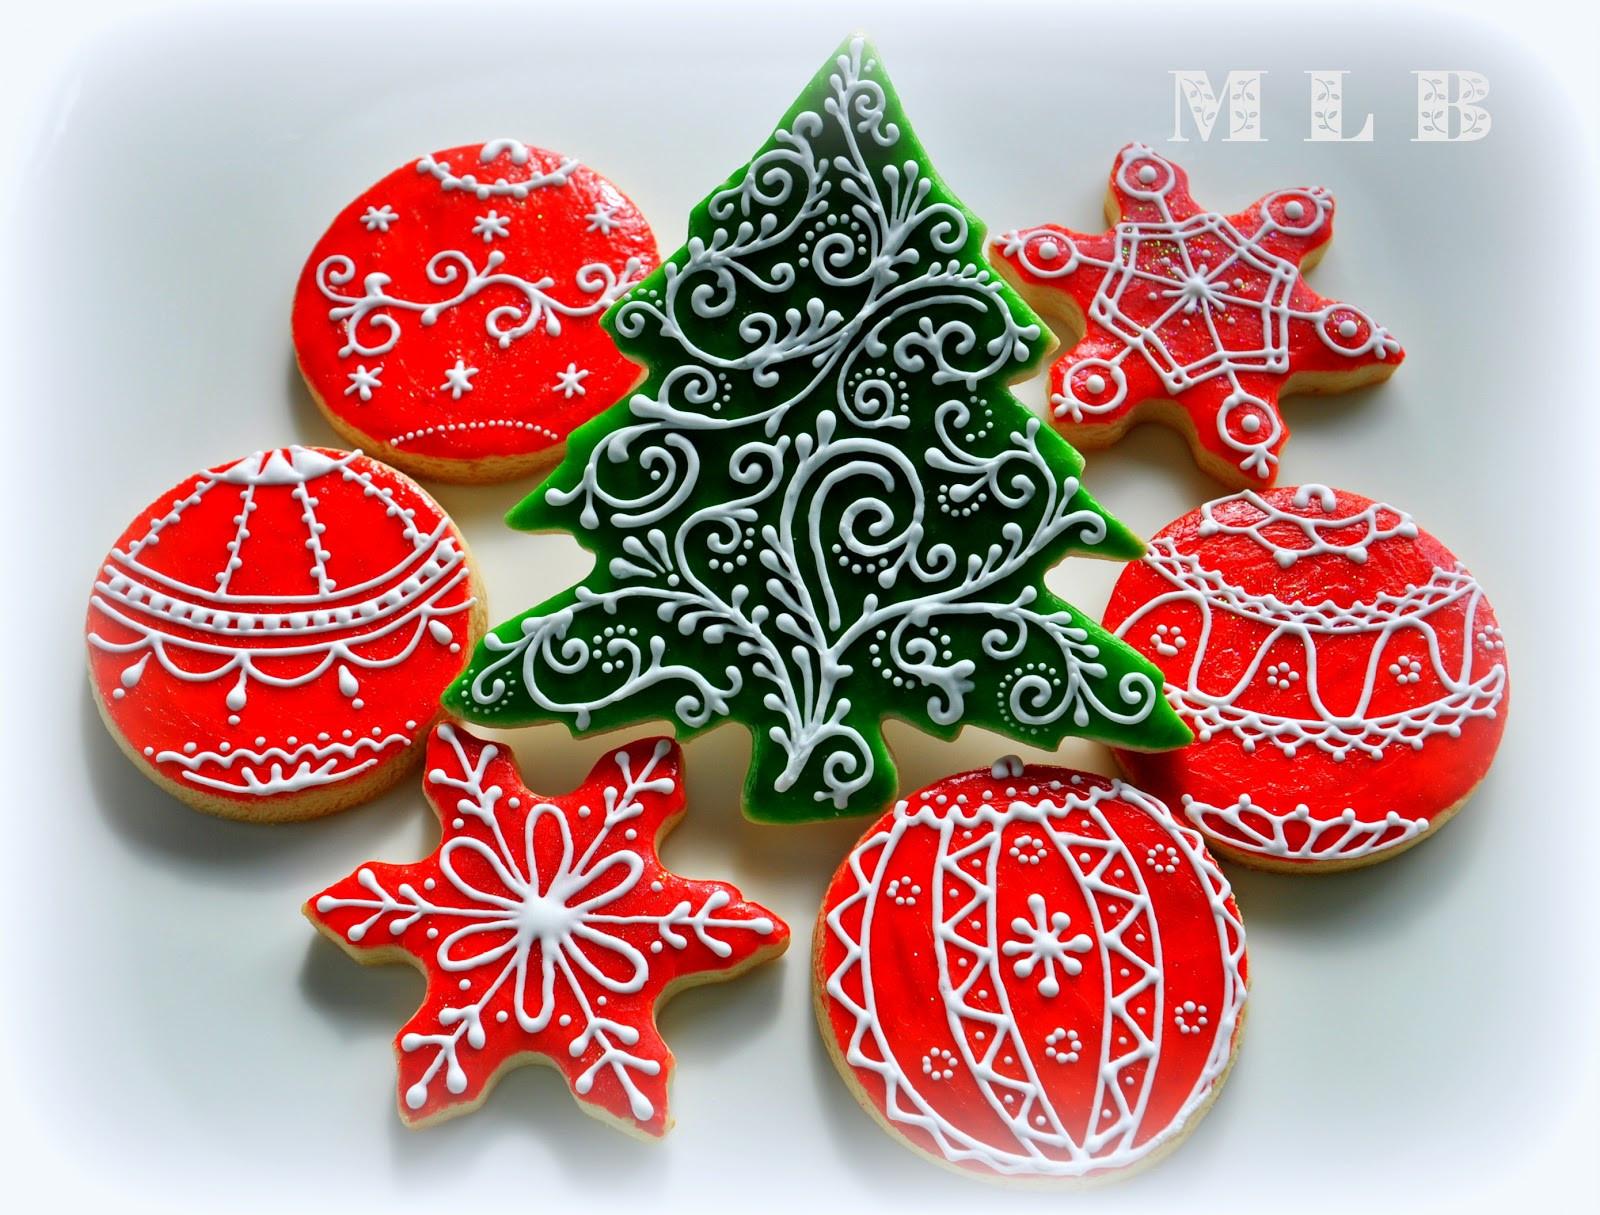 Bakery Christmas Cookies  My little bakery 🌹 Christmas tree cookies And polish